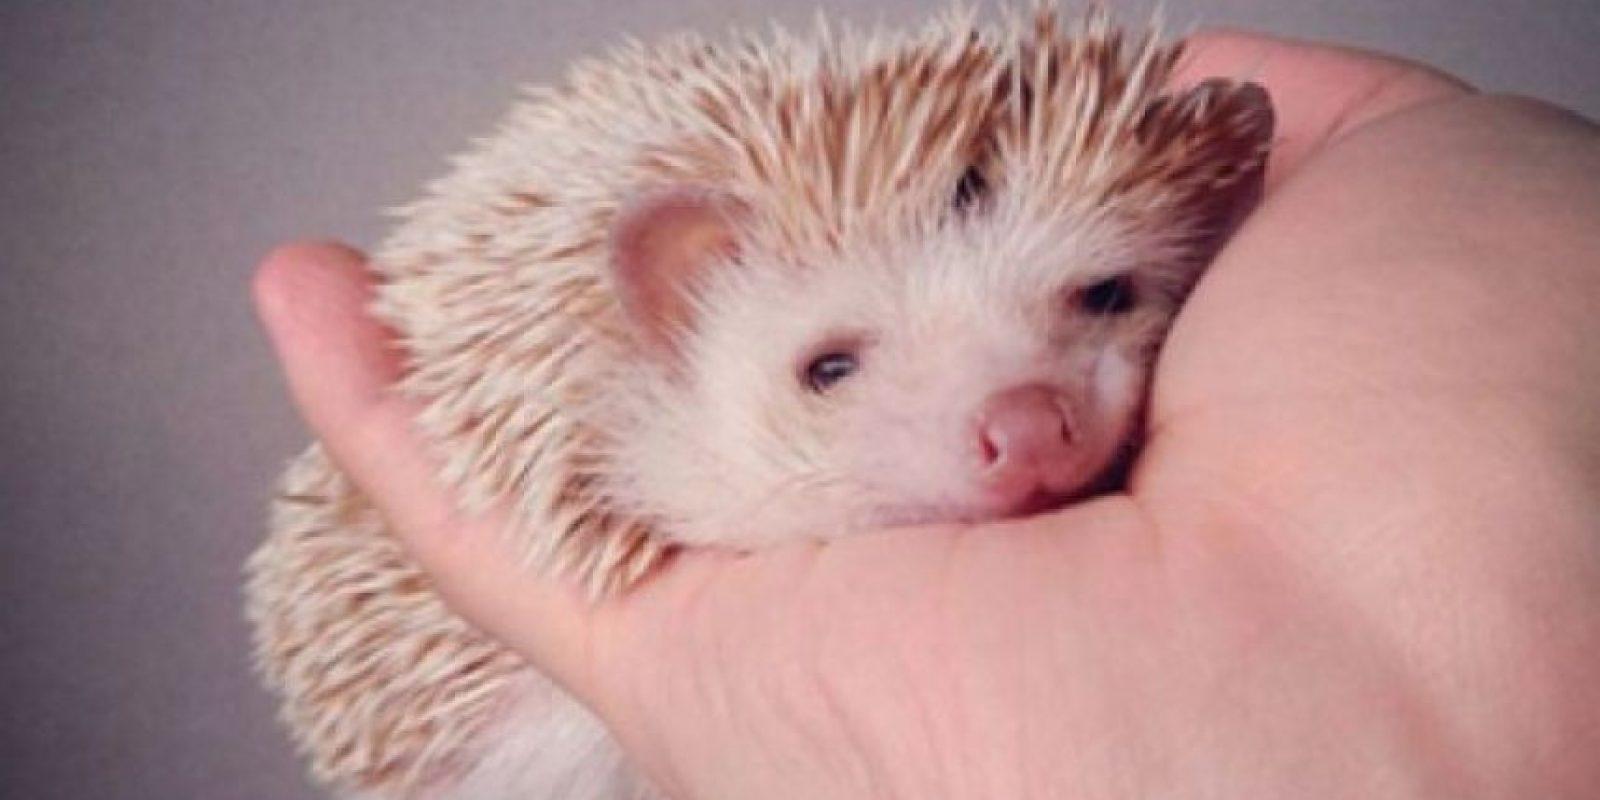 Fotos: darcytheflyinghedgehog